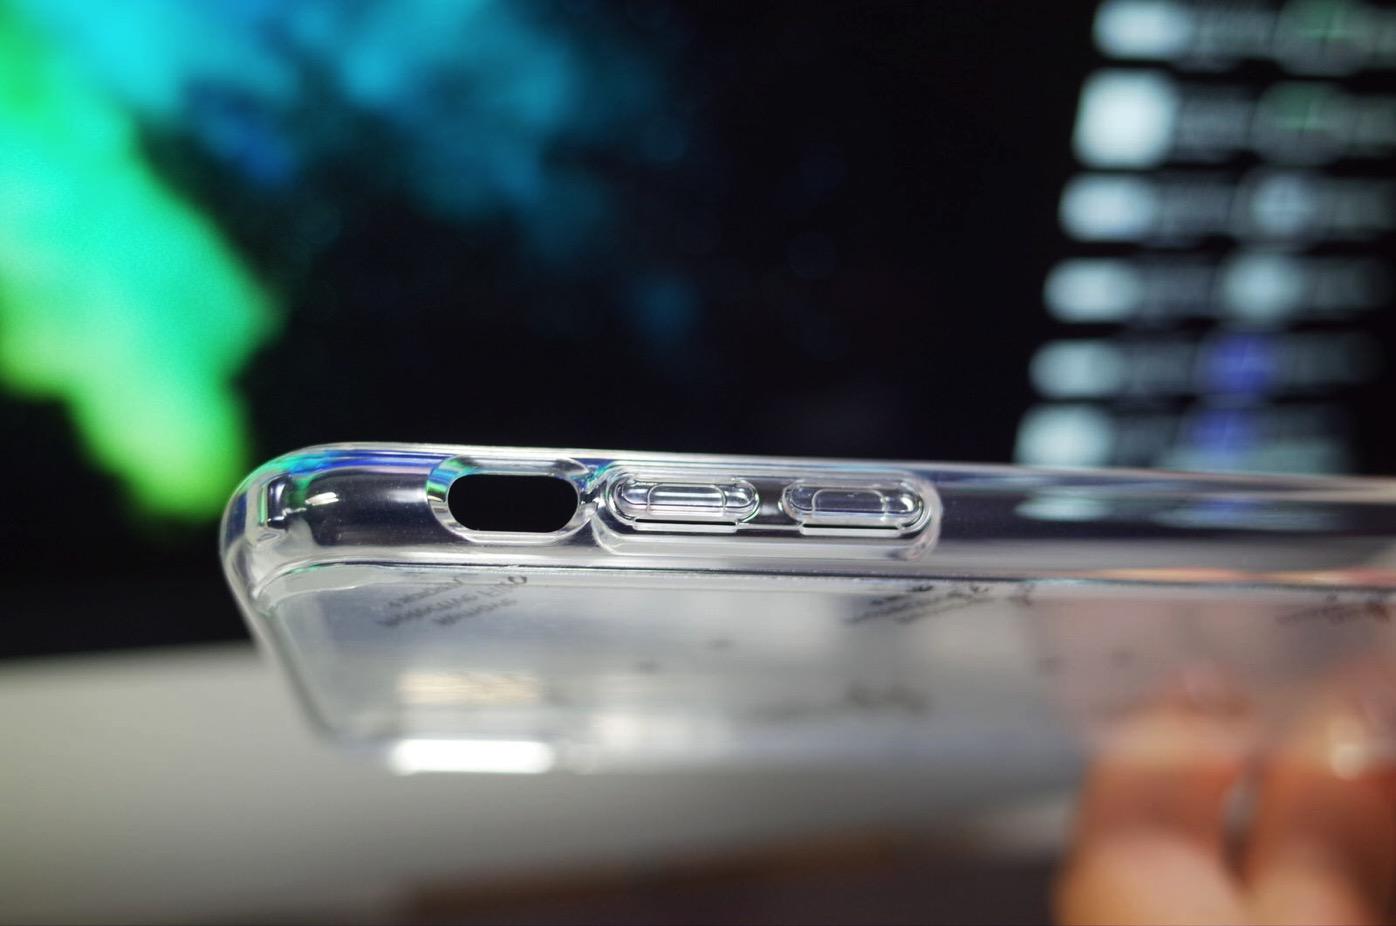 【Spigen】iPhone X ケース, [ 米軍MIL規格取得 落下 衝撃 吸収 ] ウルトラ・ハイブリッド アイフォン X 用 耐衝撃 カバー-9